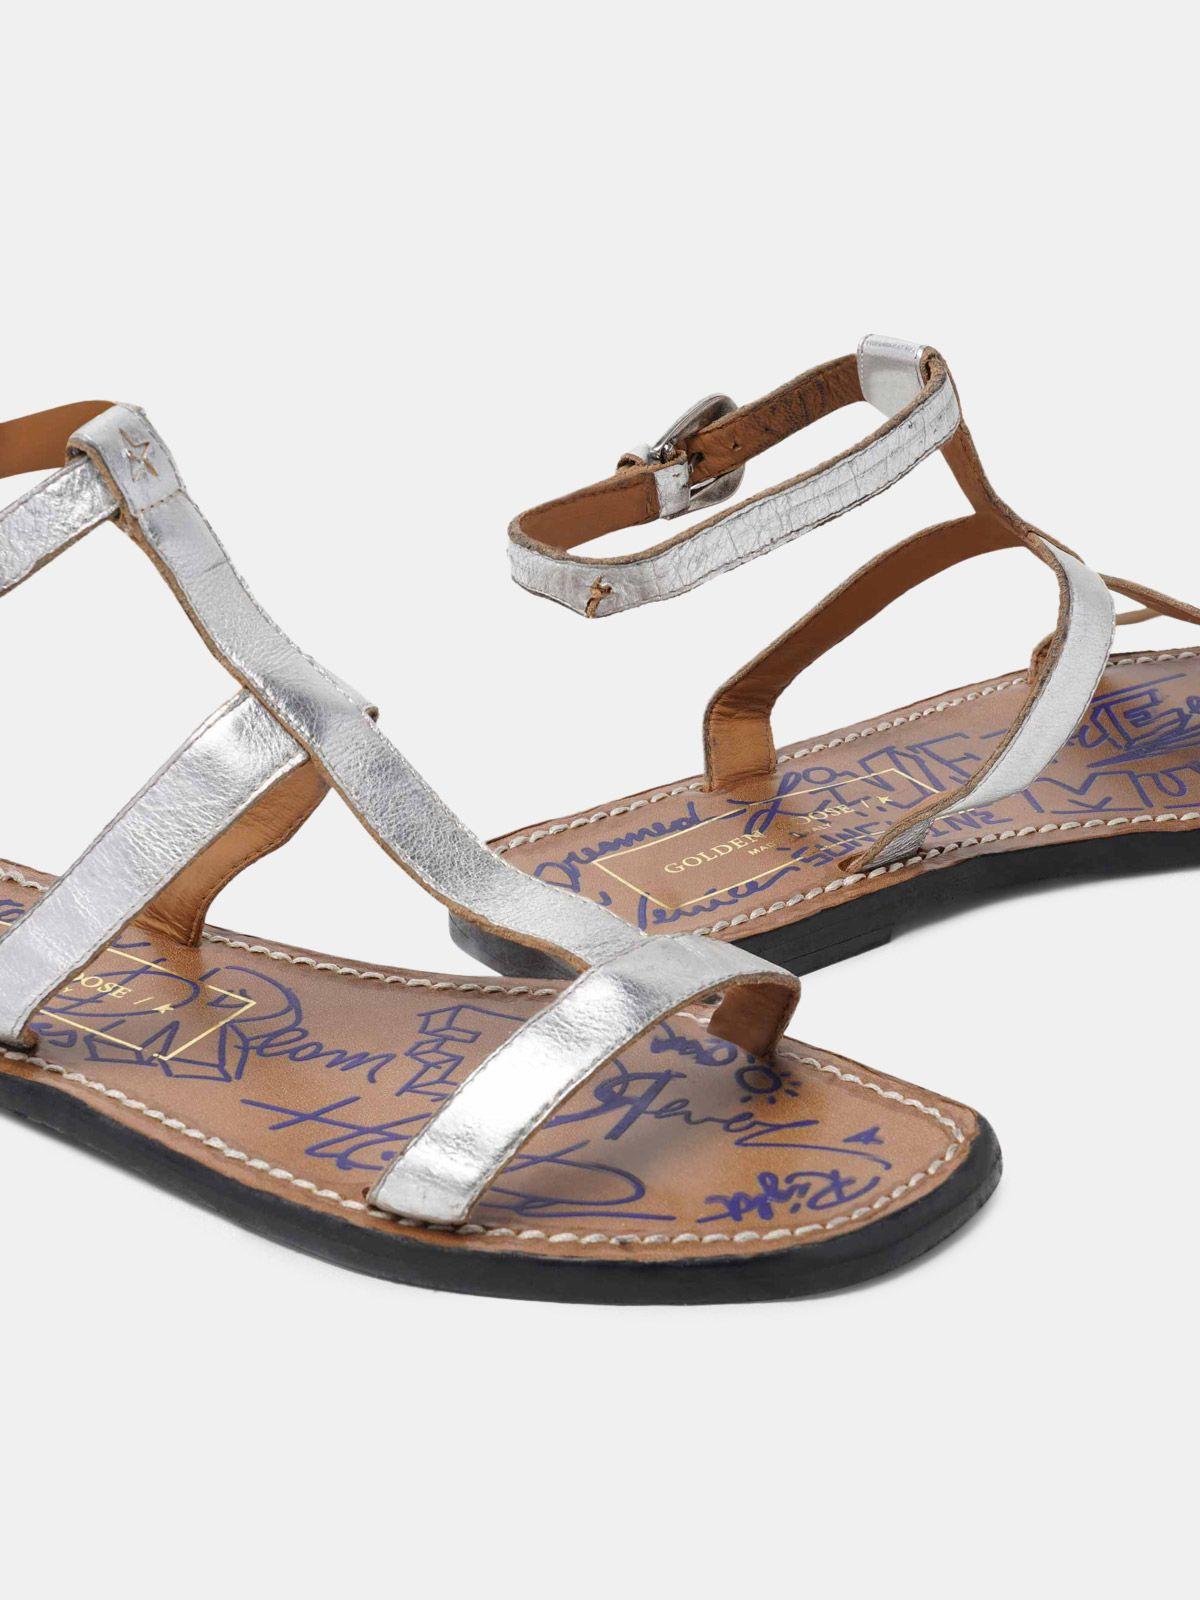 Golden Goose - Dakota sandals in silver leather in